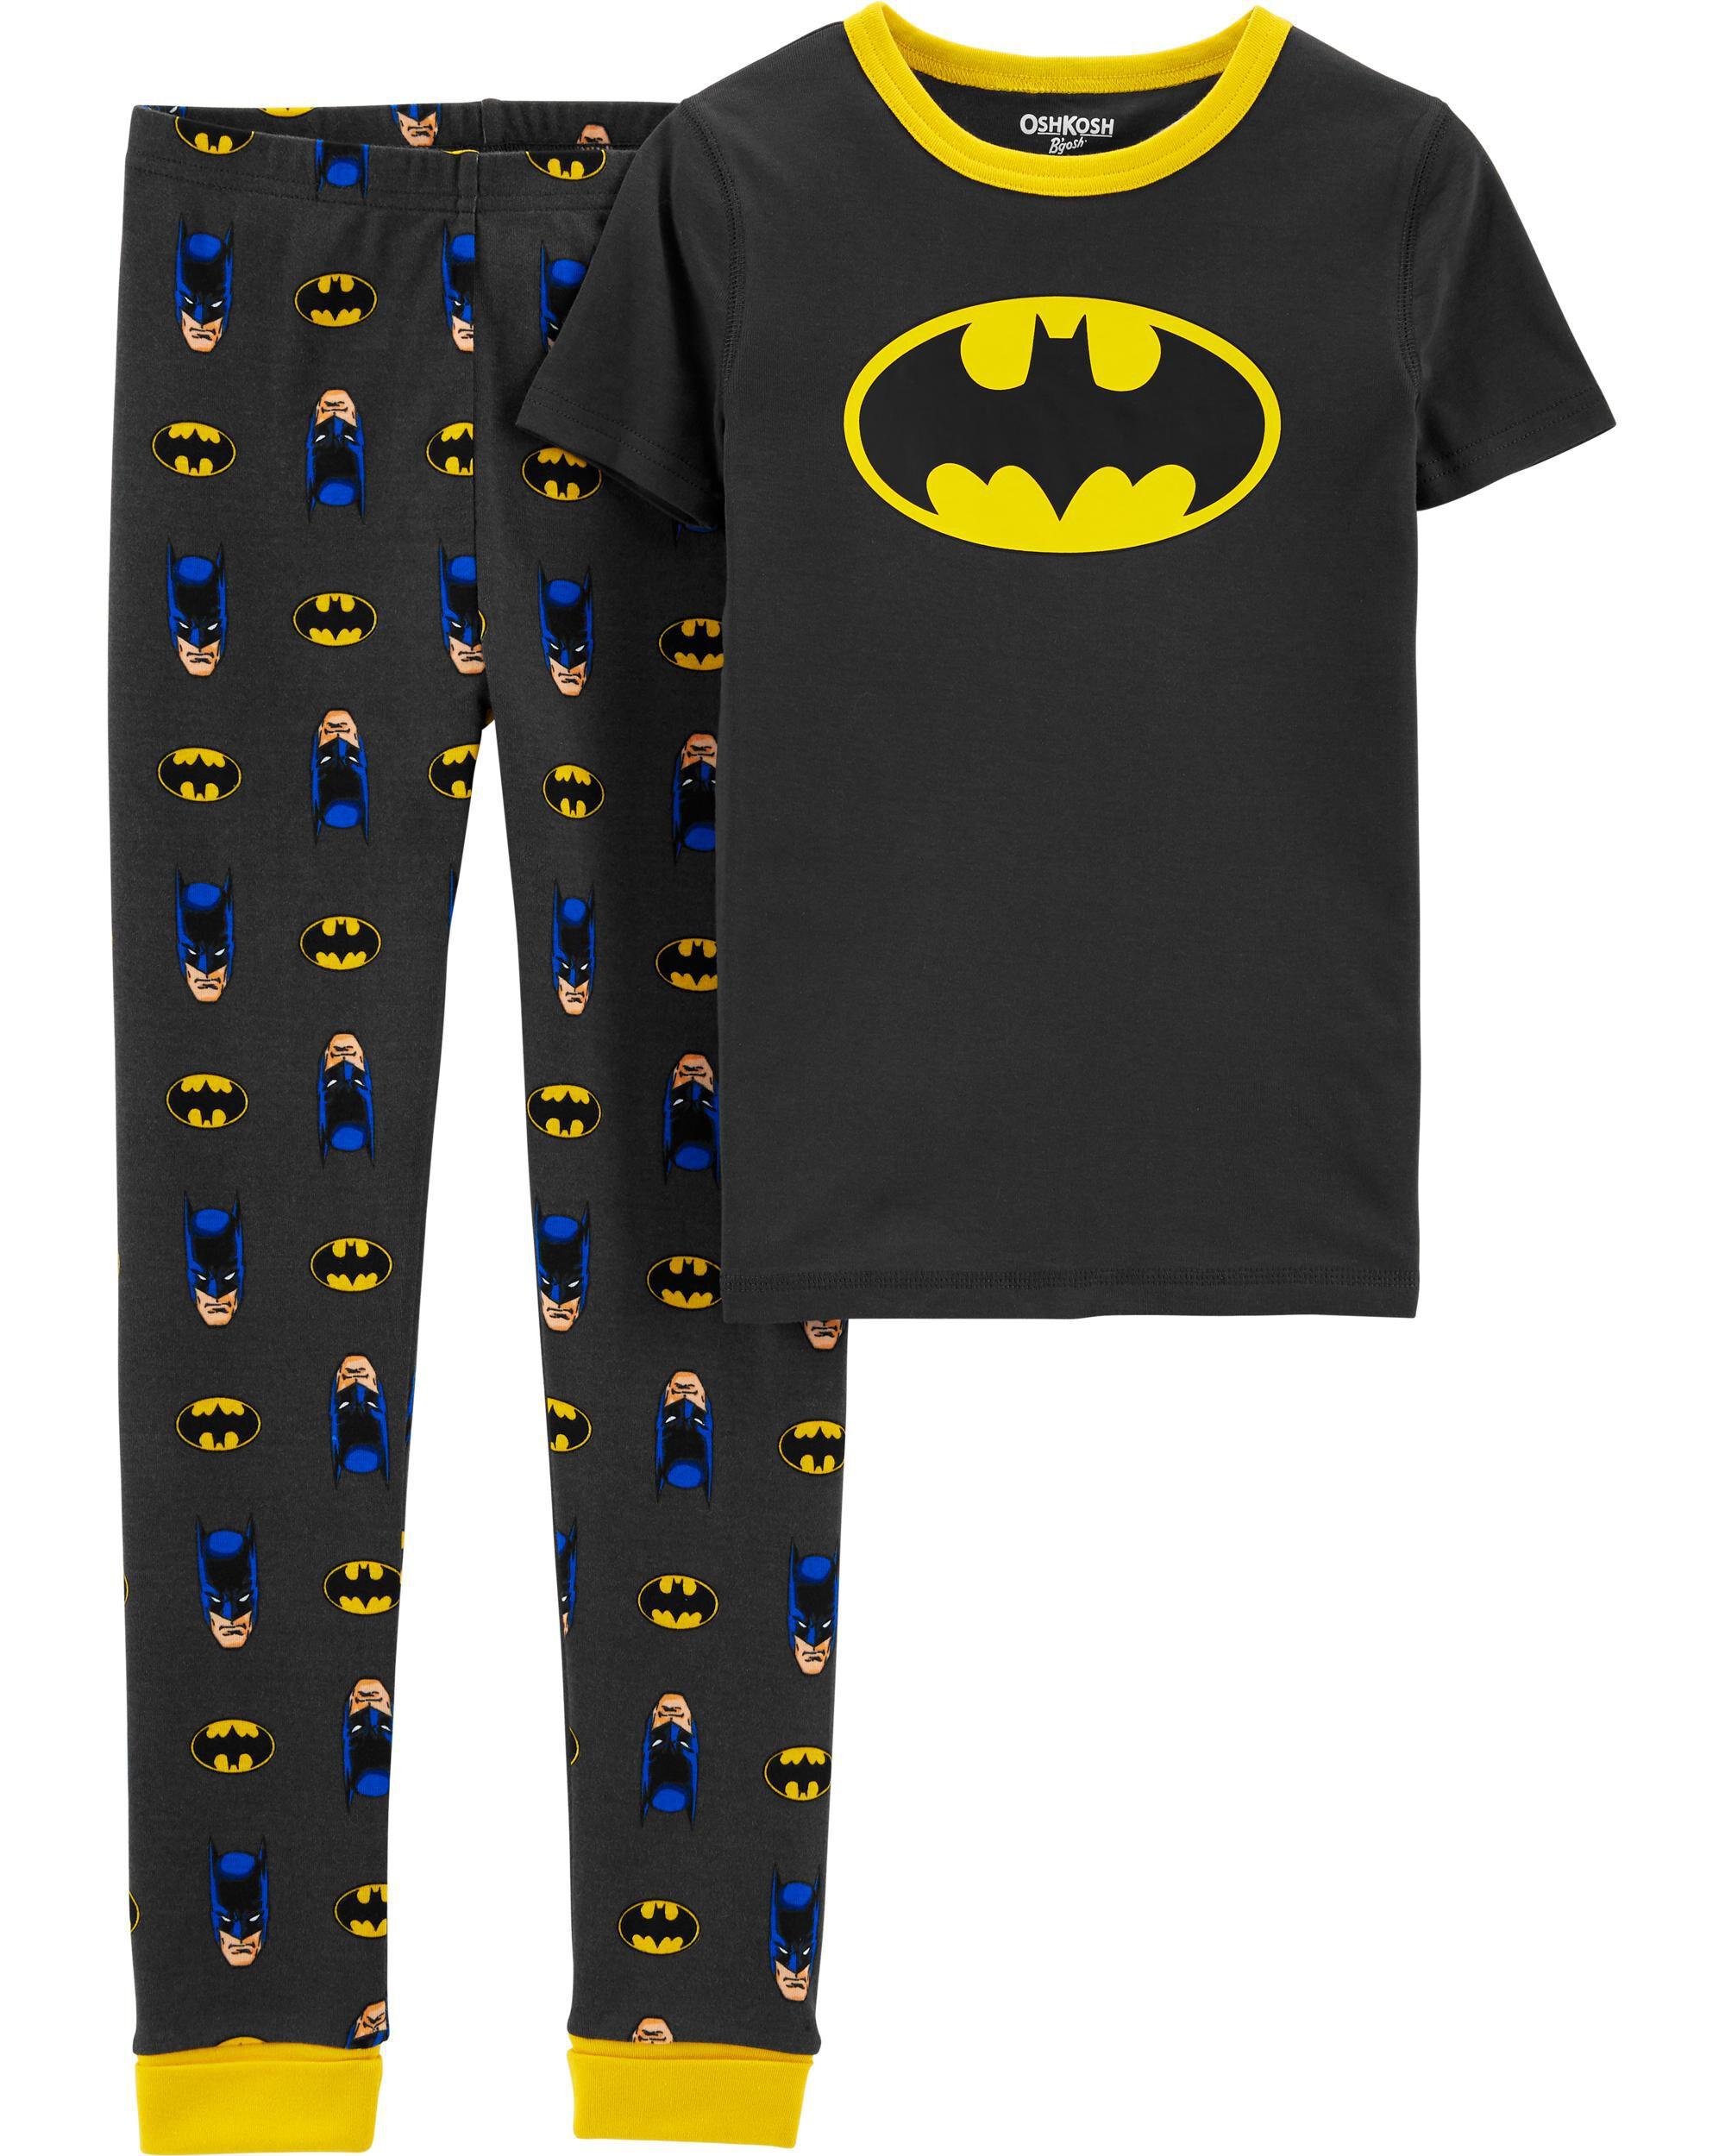 Batman Infant and Toddler Boys Gray Snug Fit Cotton Pajamas Superhero PJ Set